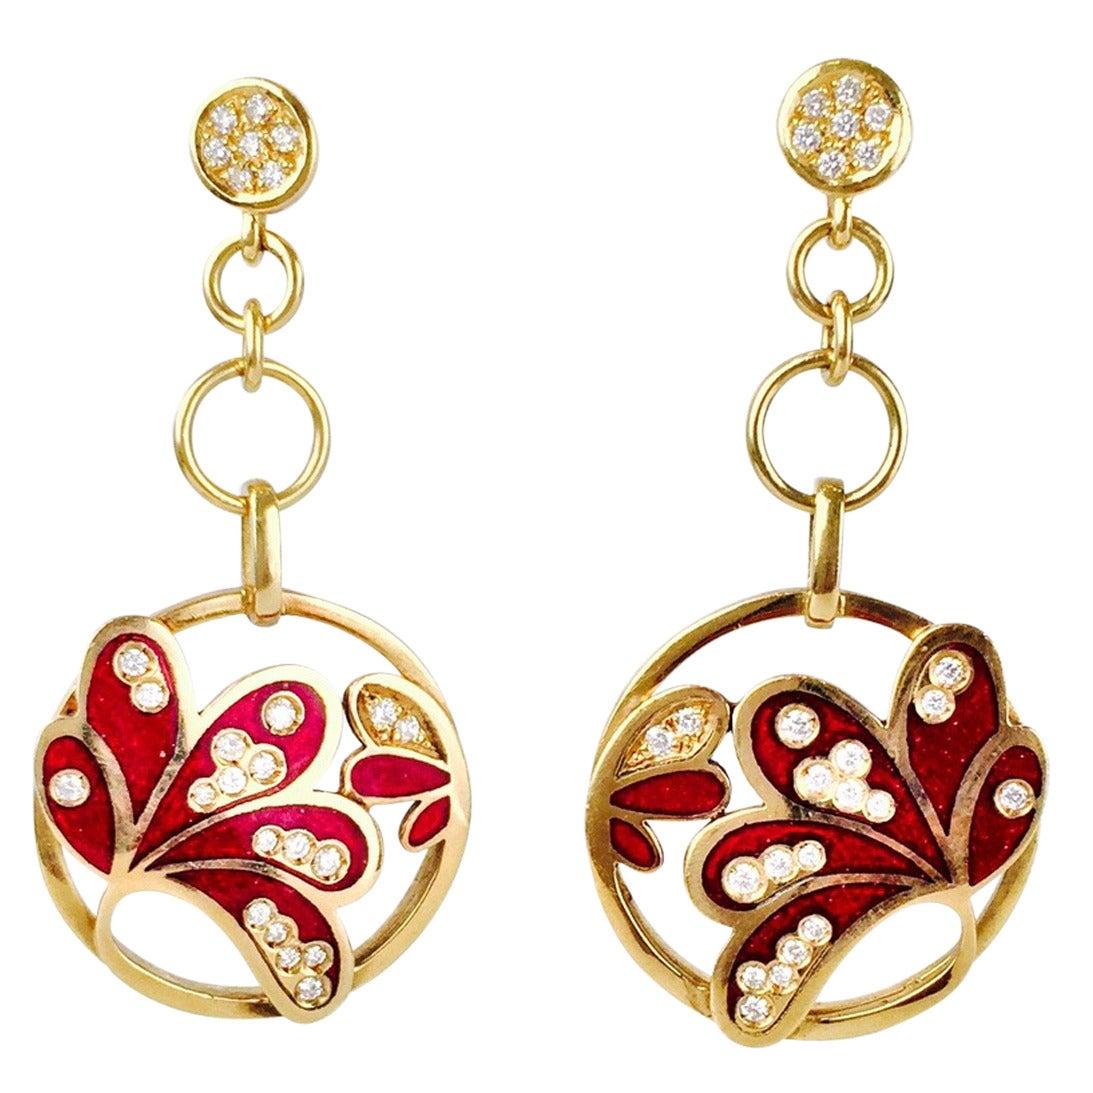 Allesandro Fanfani Enamel Diamond Gold Dangle Earrings For Sale